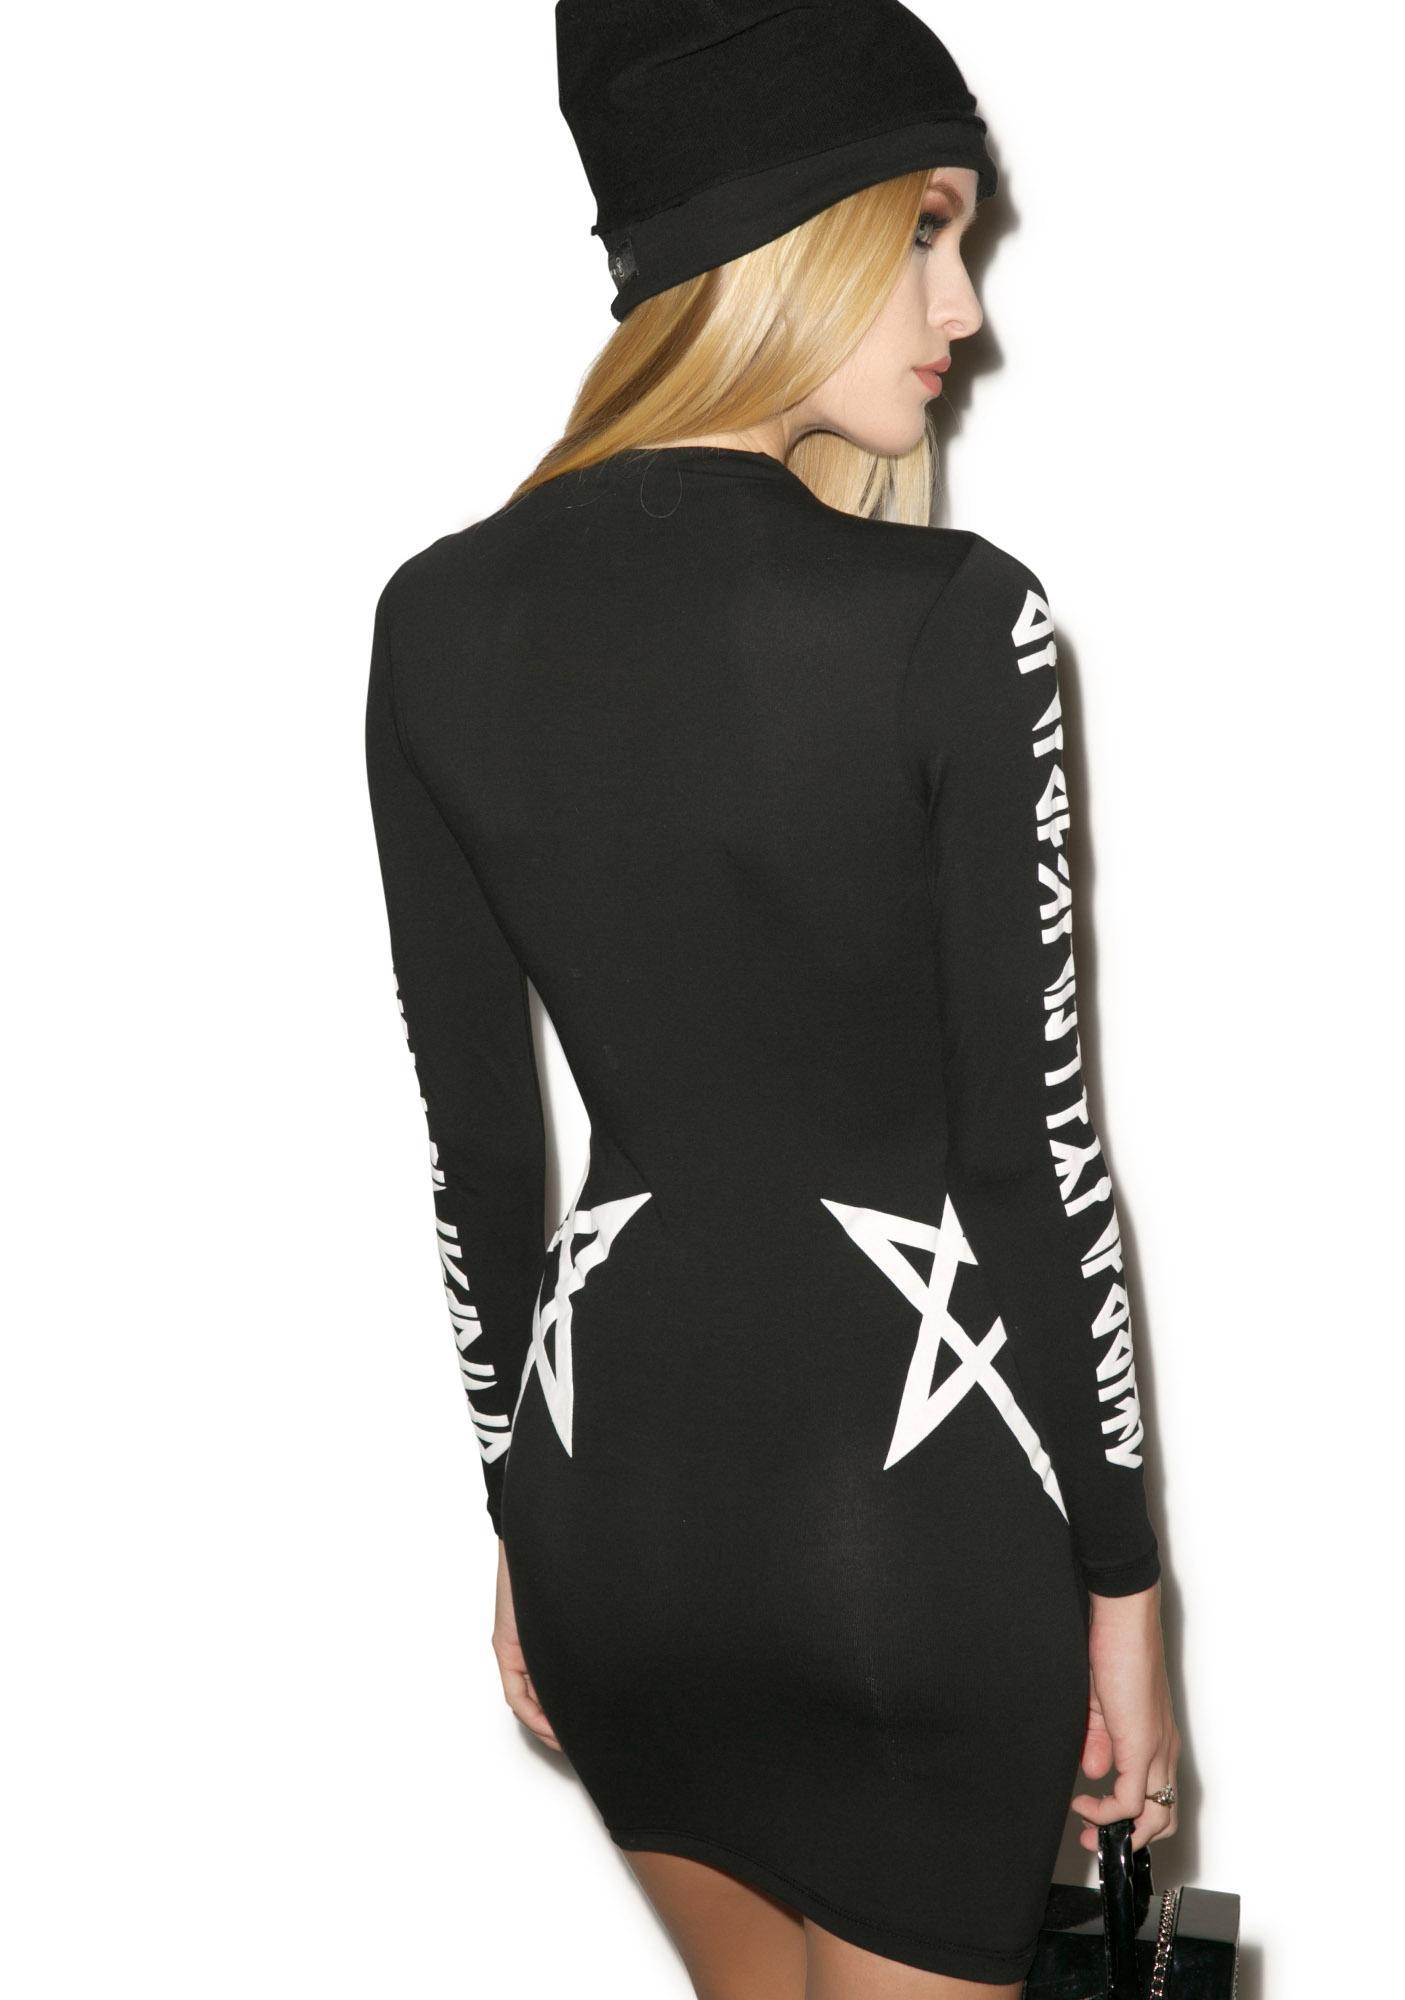 Long Clothing Hexagram Dress